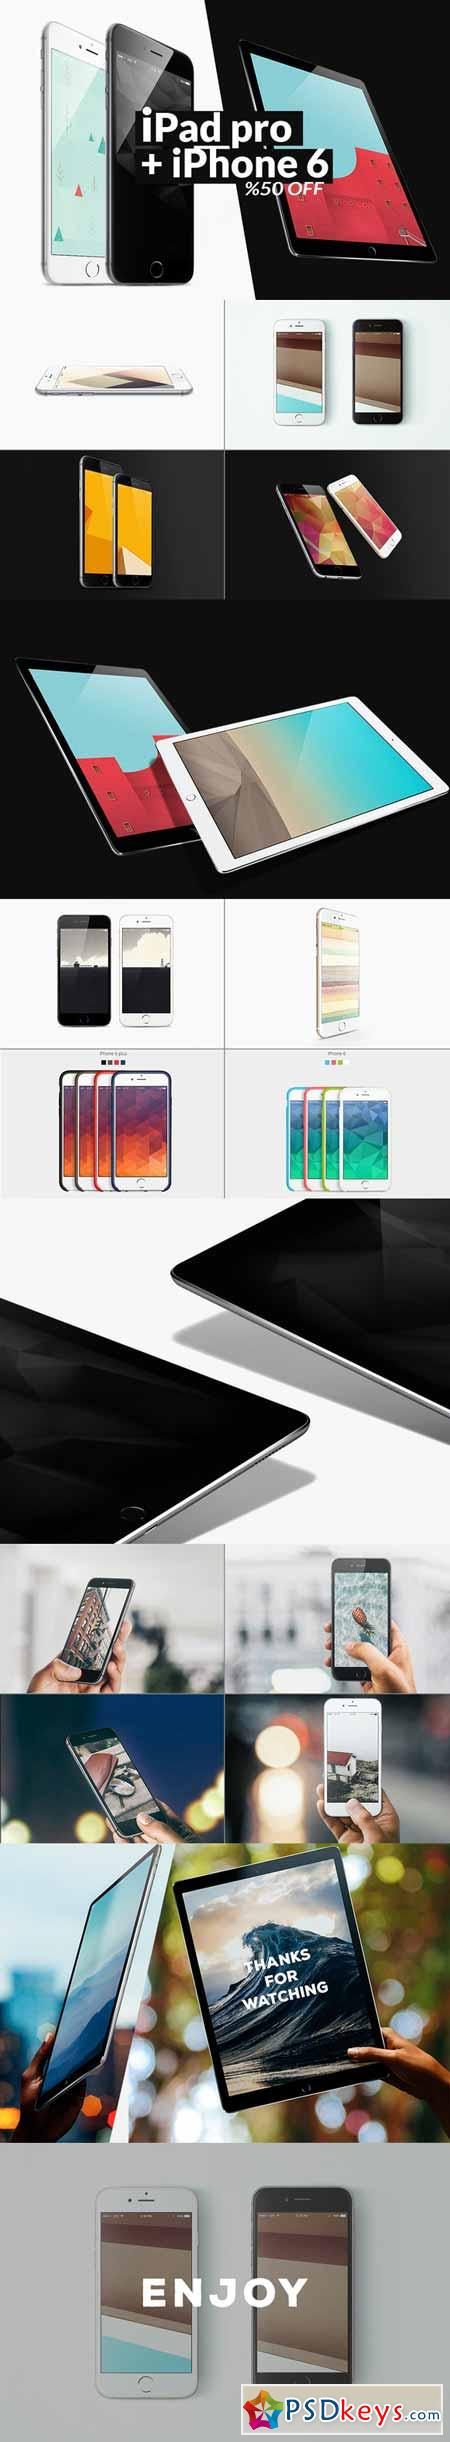 iPad pro+ iPhone 6 Mockups Bundle 381675